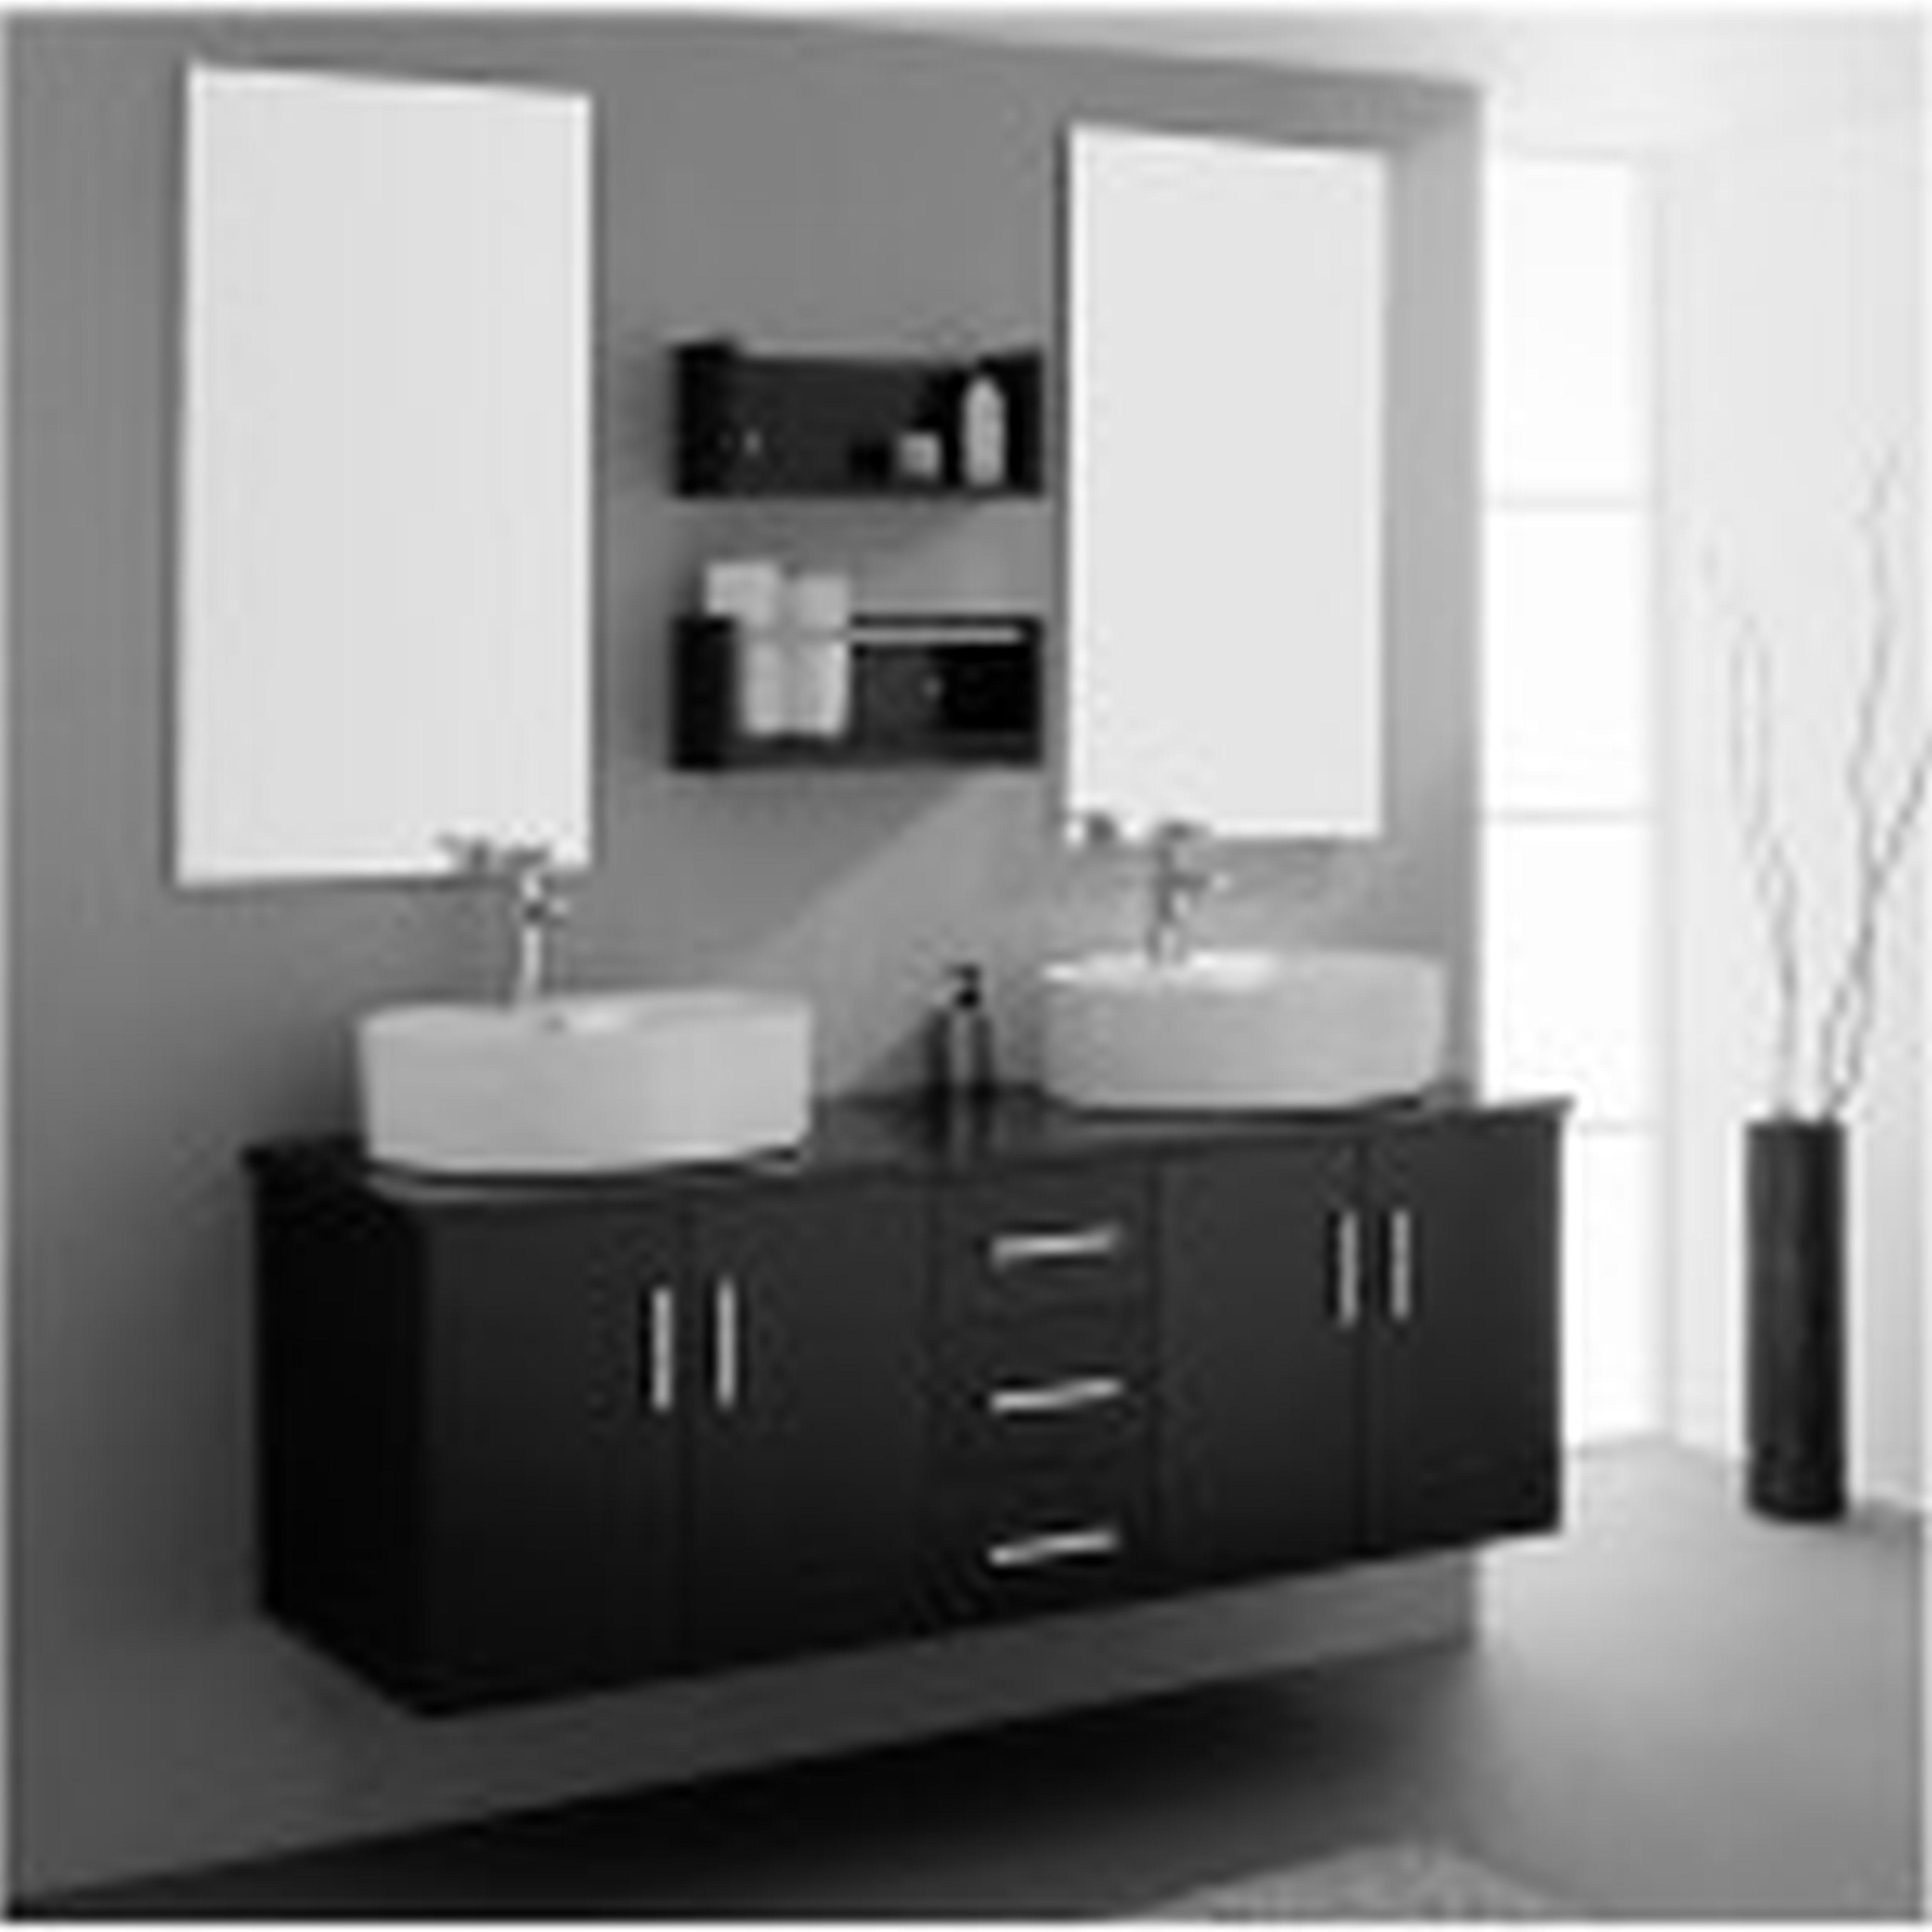 Grey Bathroom Ideas Black And Matsa White Home Interior Design Photos The  East Market House Coop